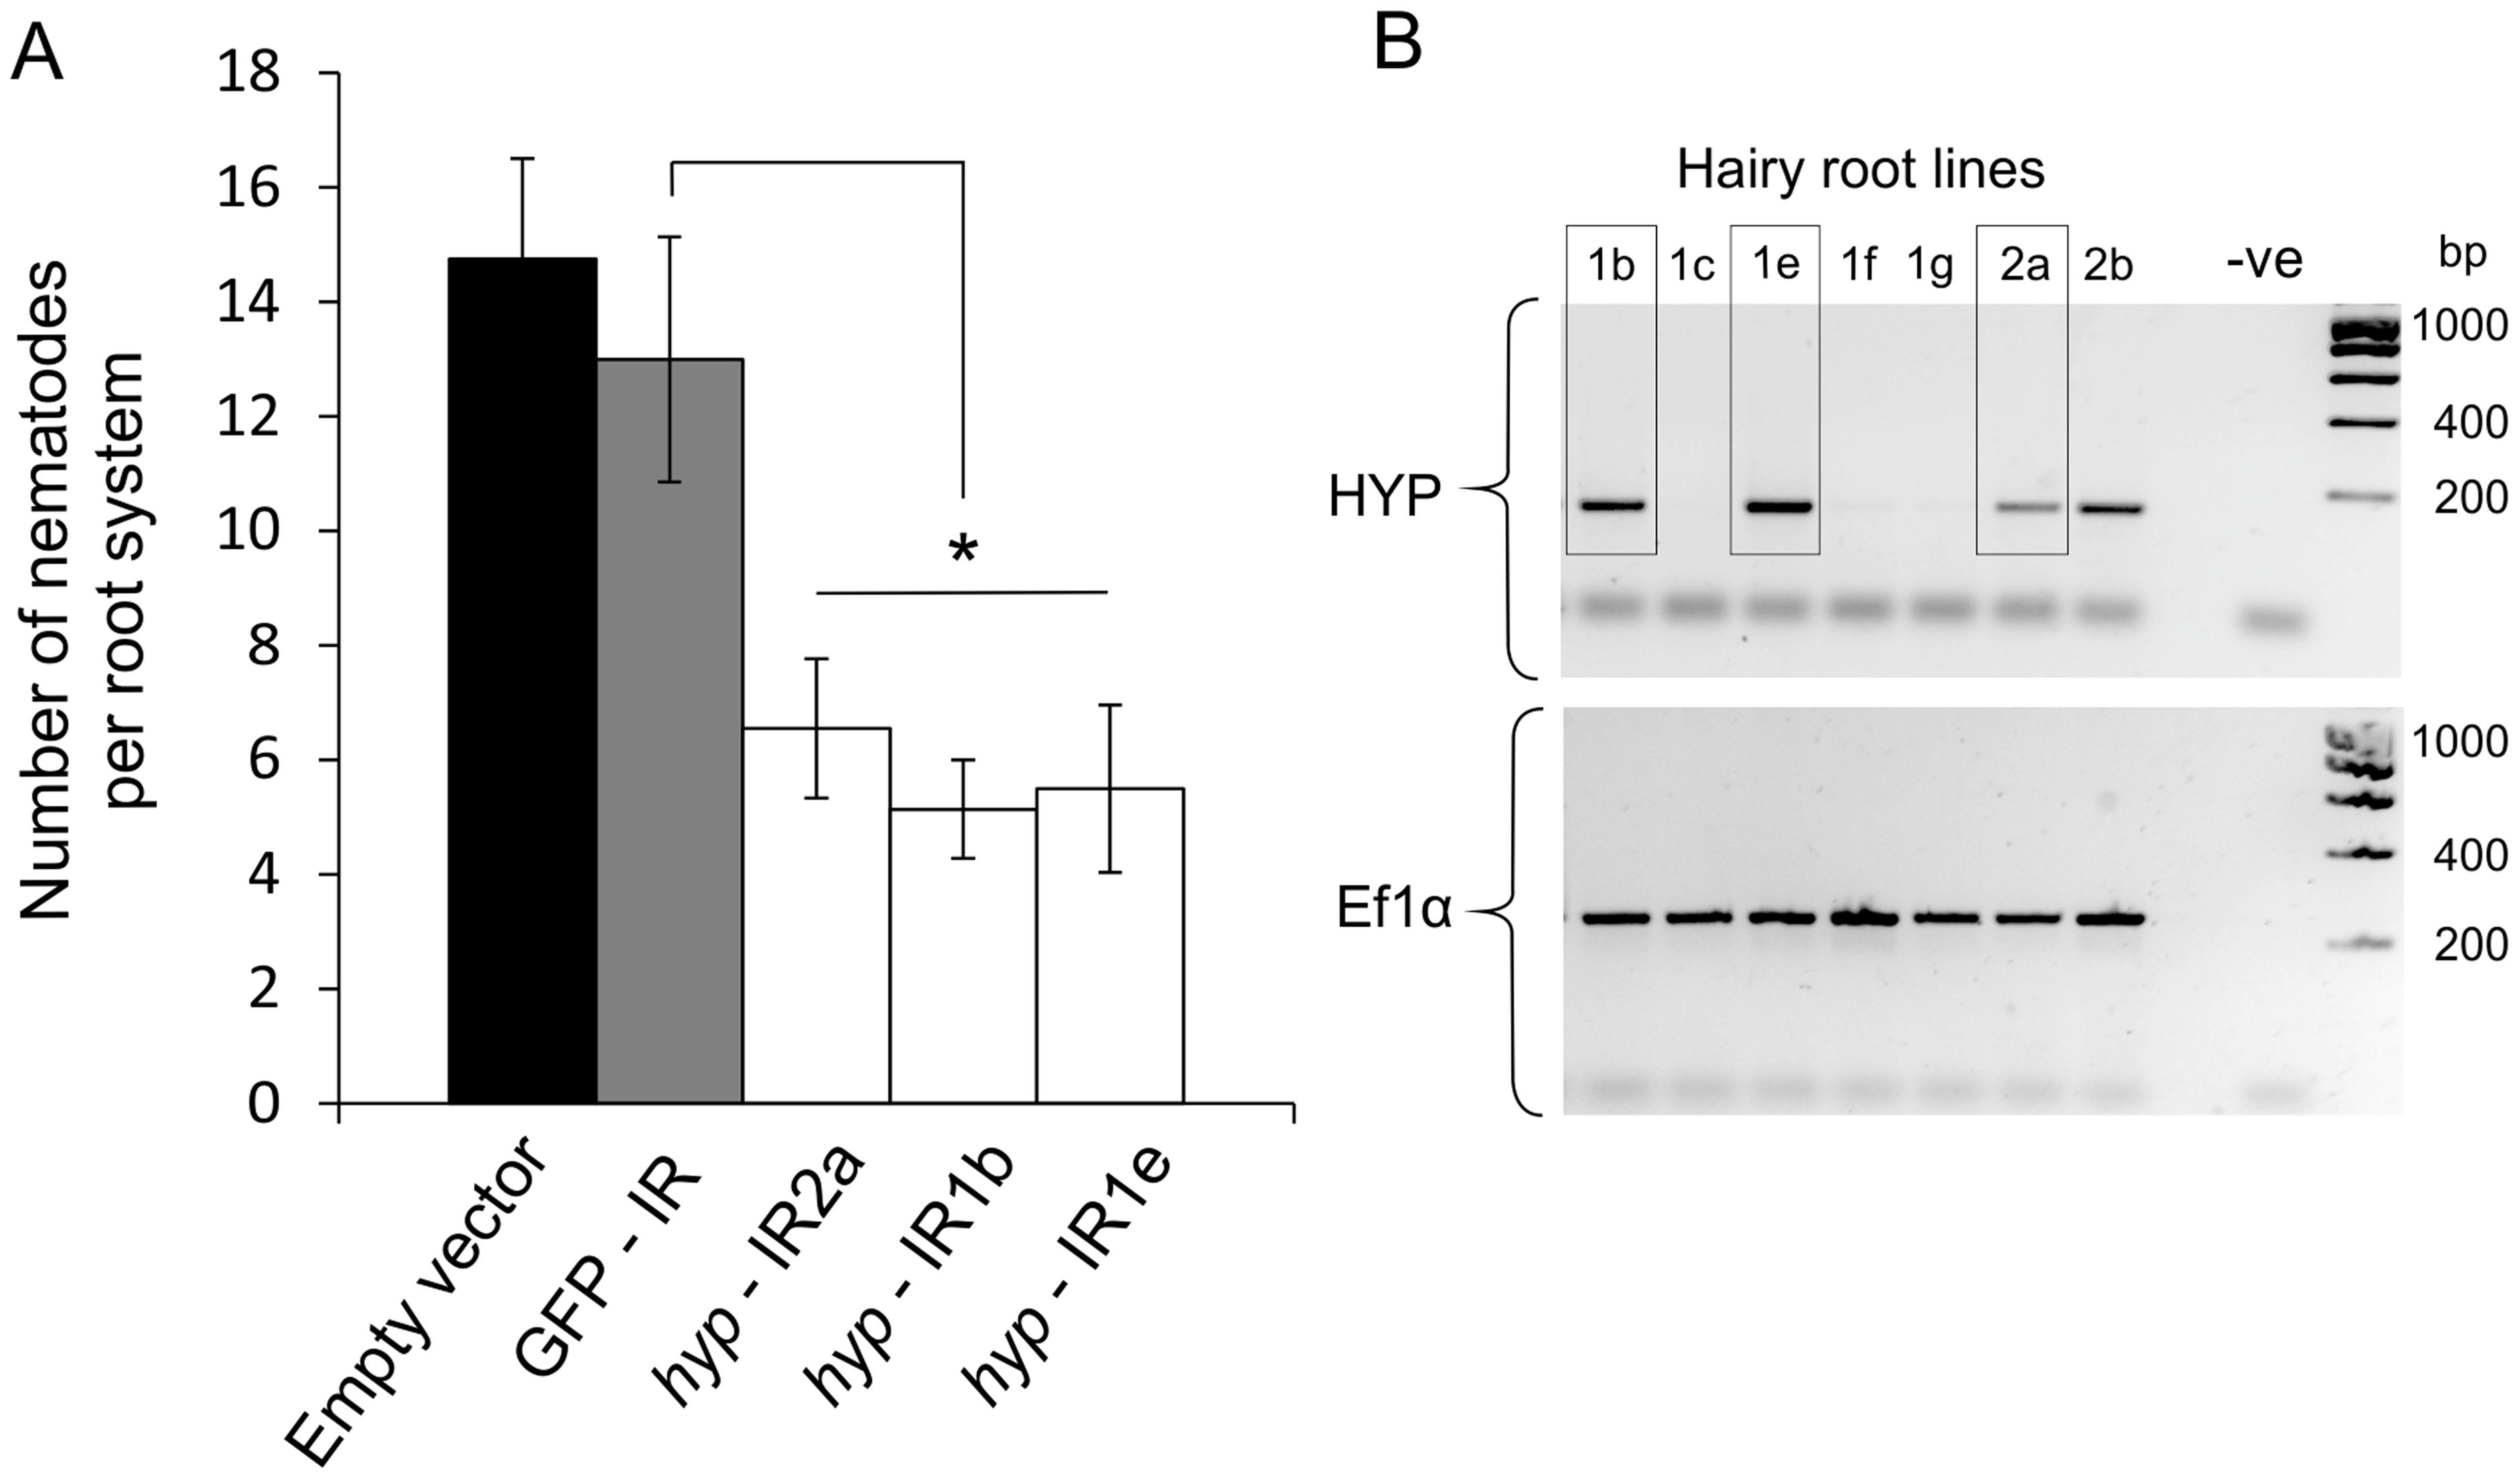 RNA interference of <i>Gp-hyp</i> genes.